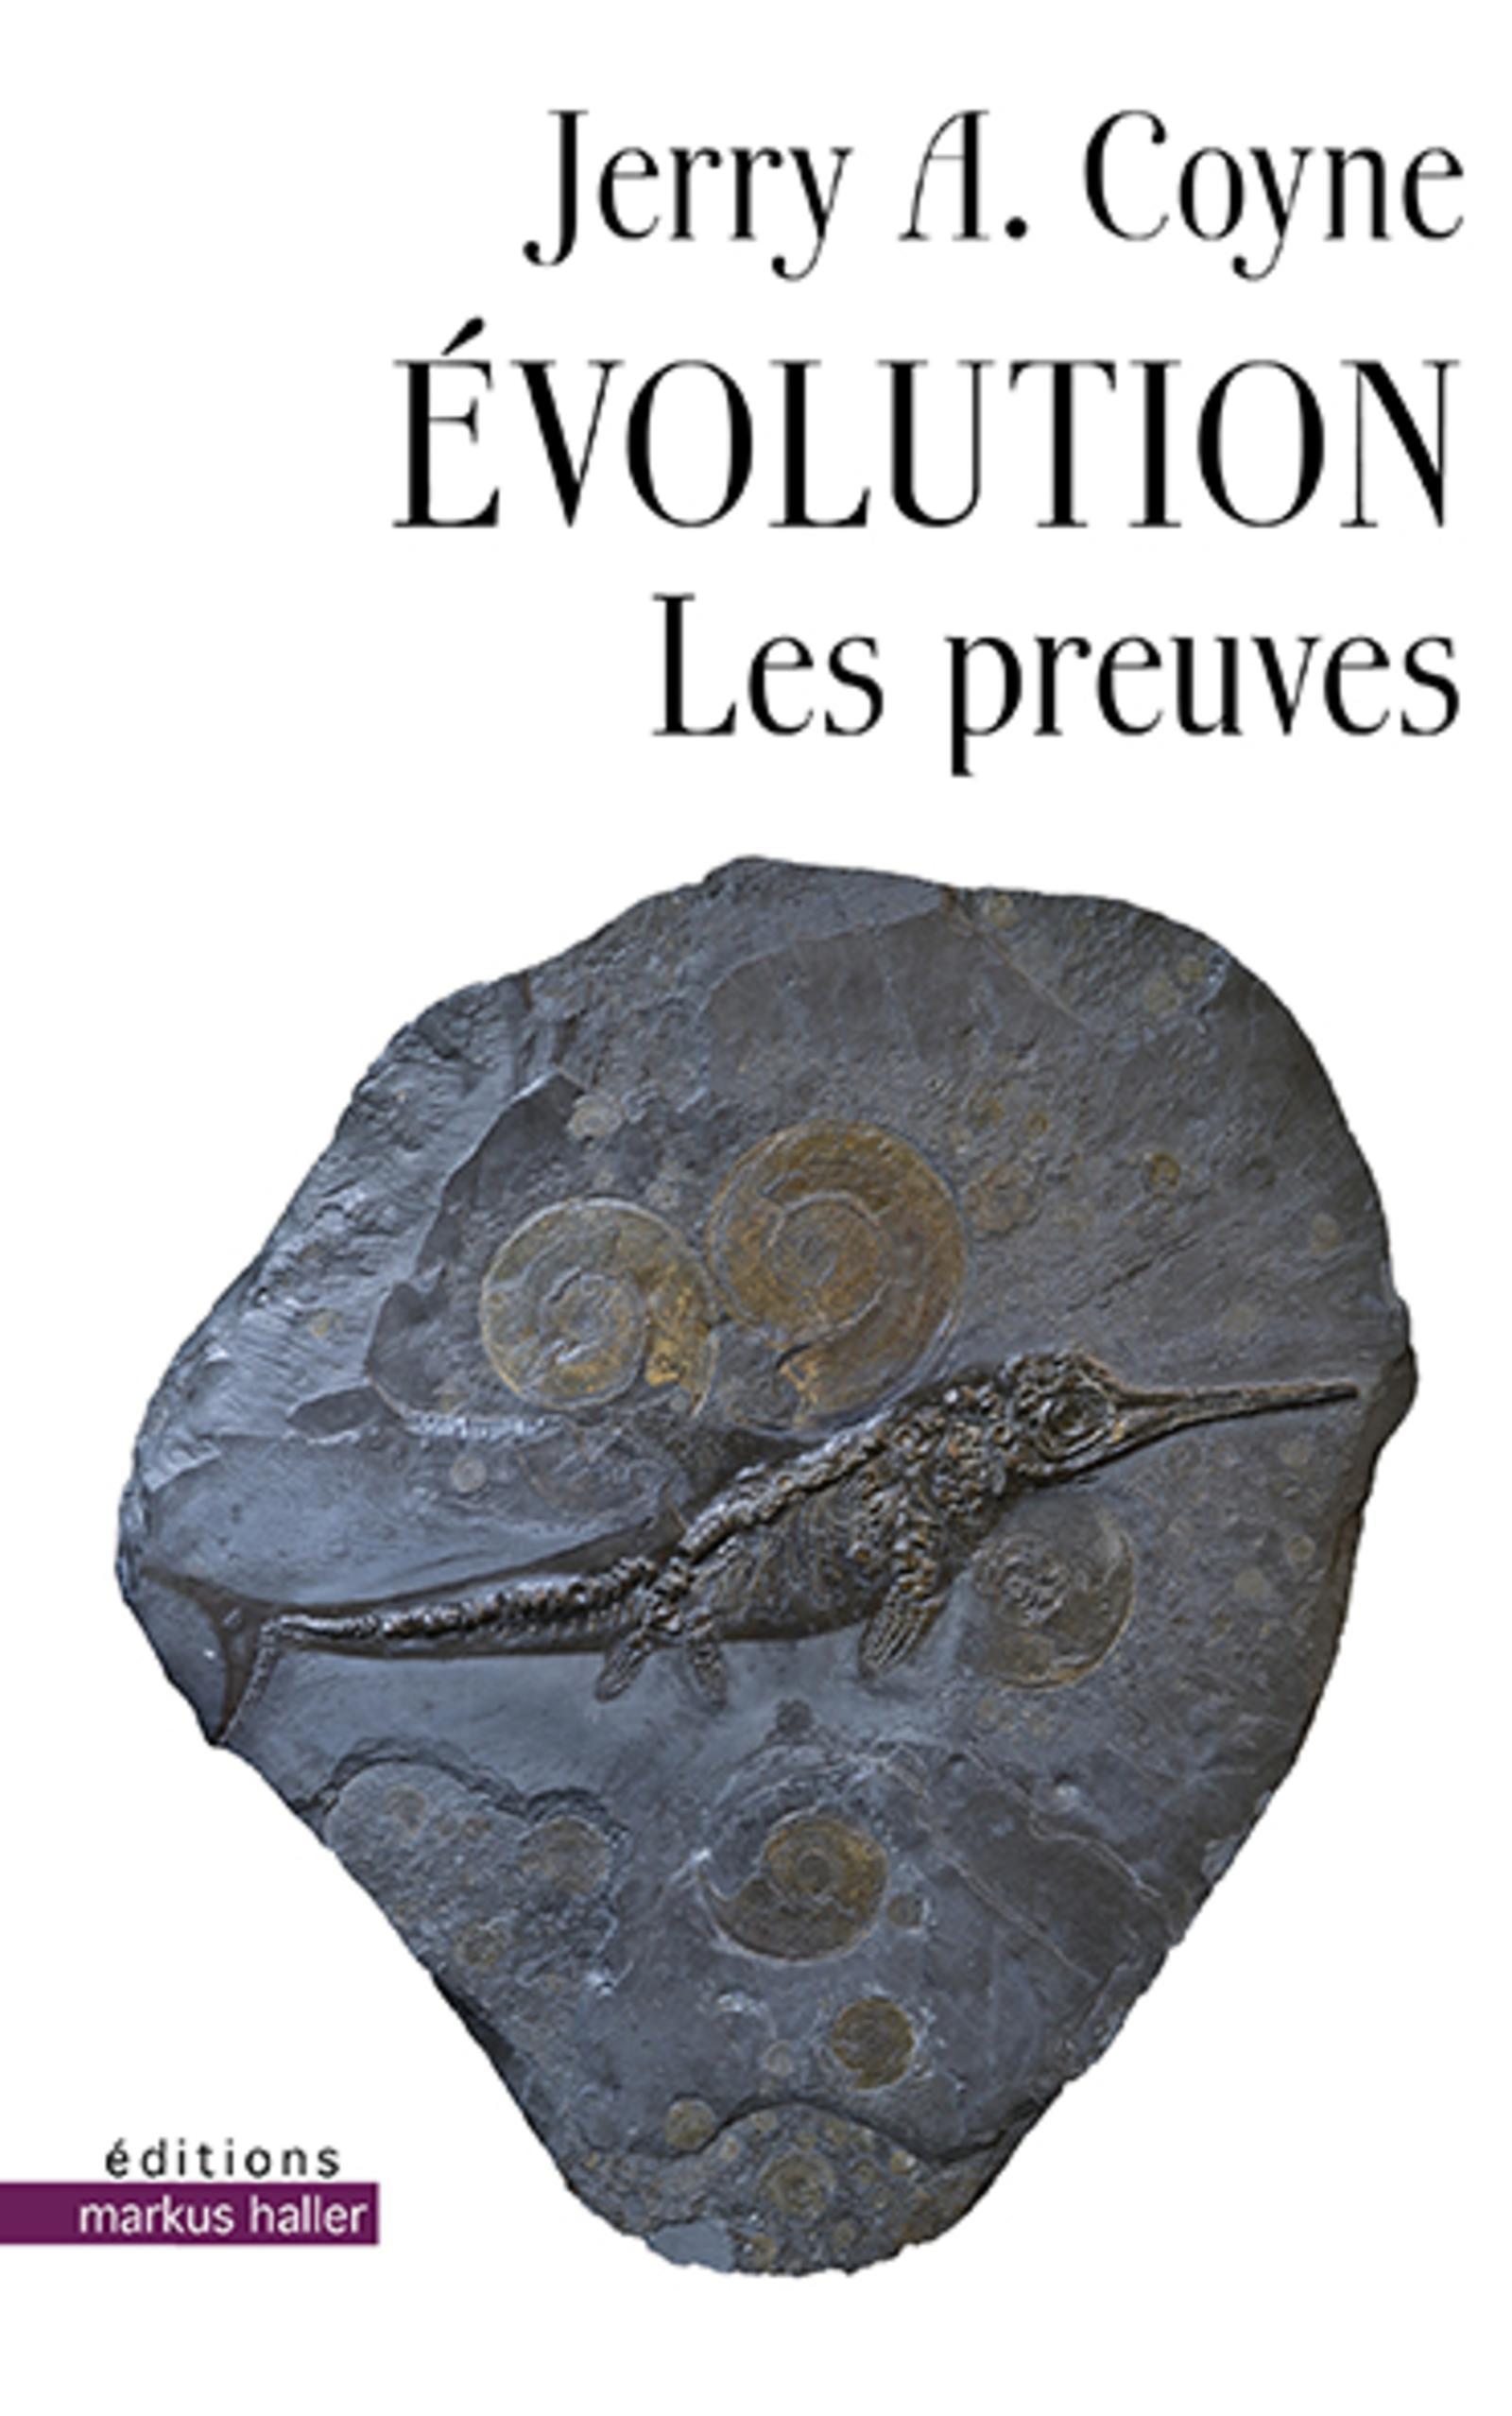 EVOLUTION - LES PREUVES